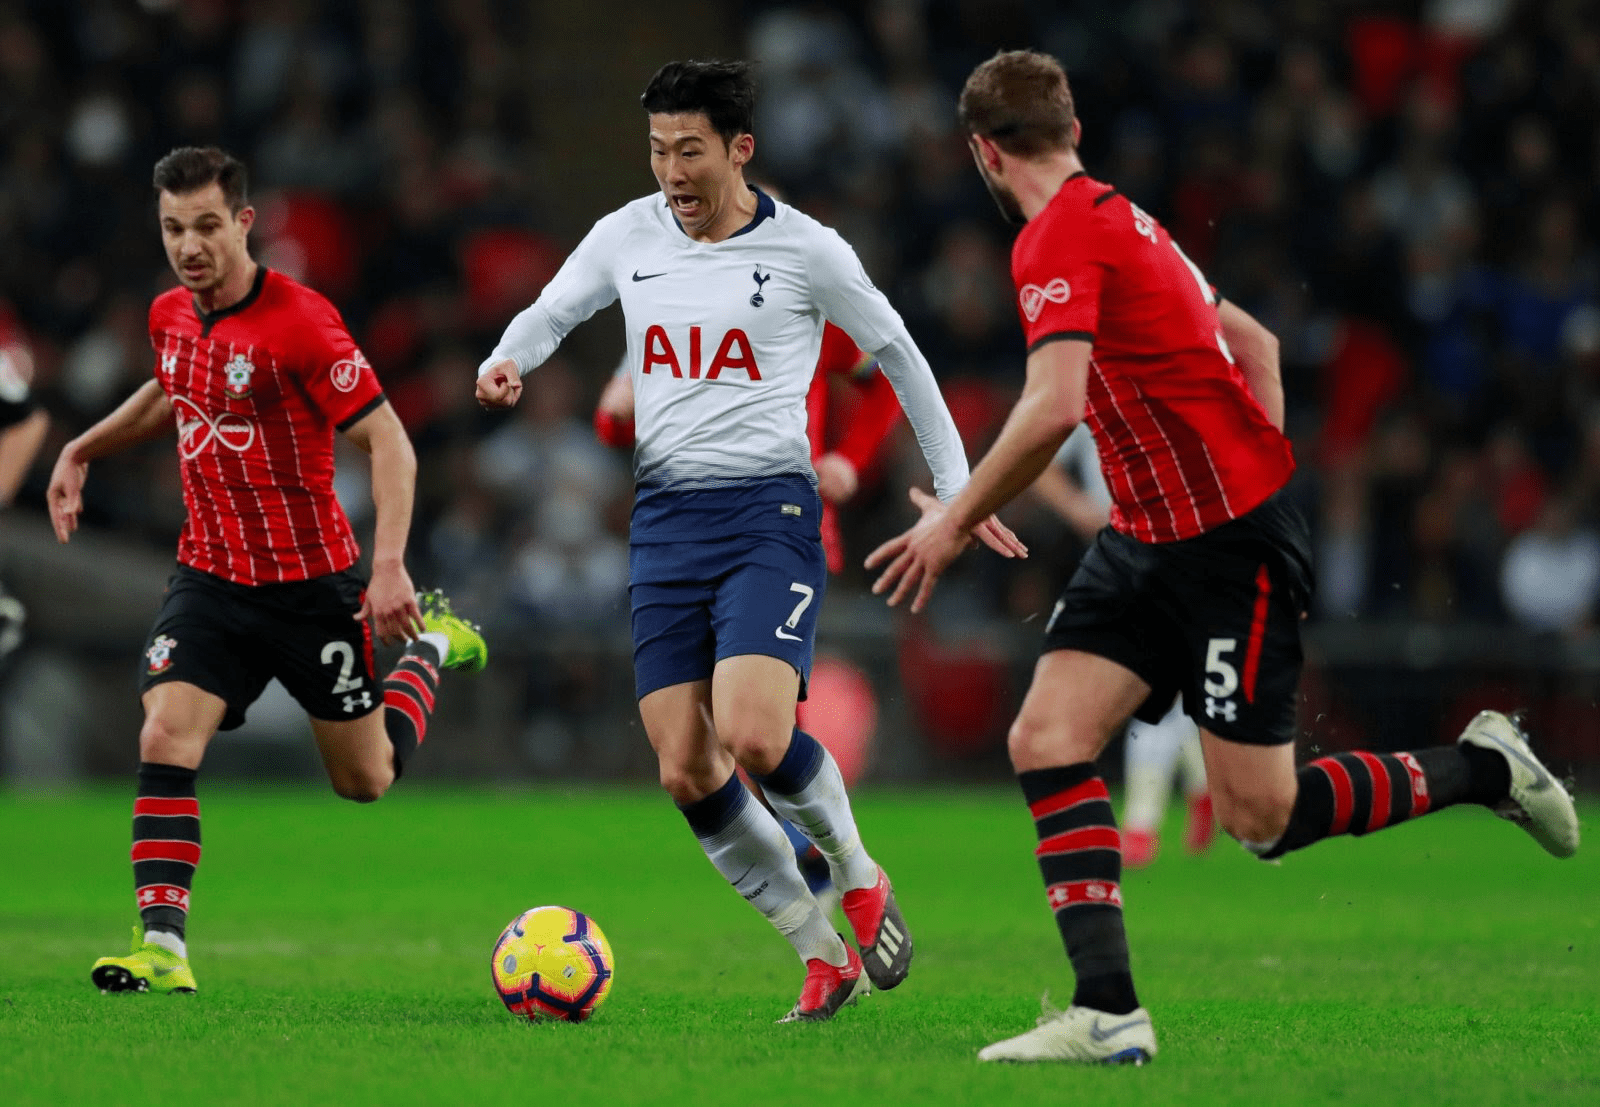 Nhận định, Soi kèo Tottenham vs Southampton ngày 6/2/2020